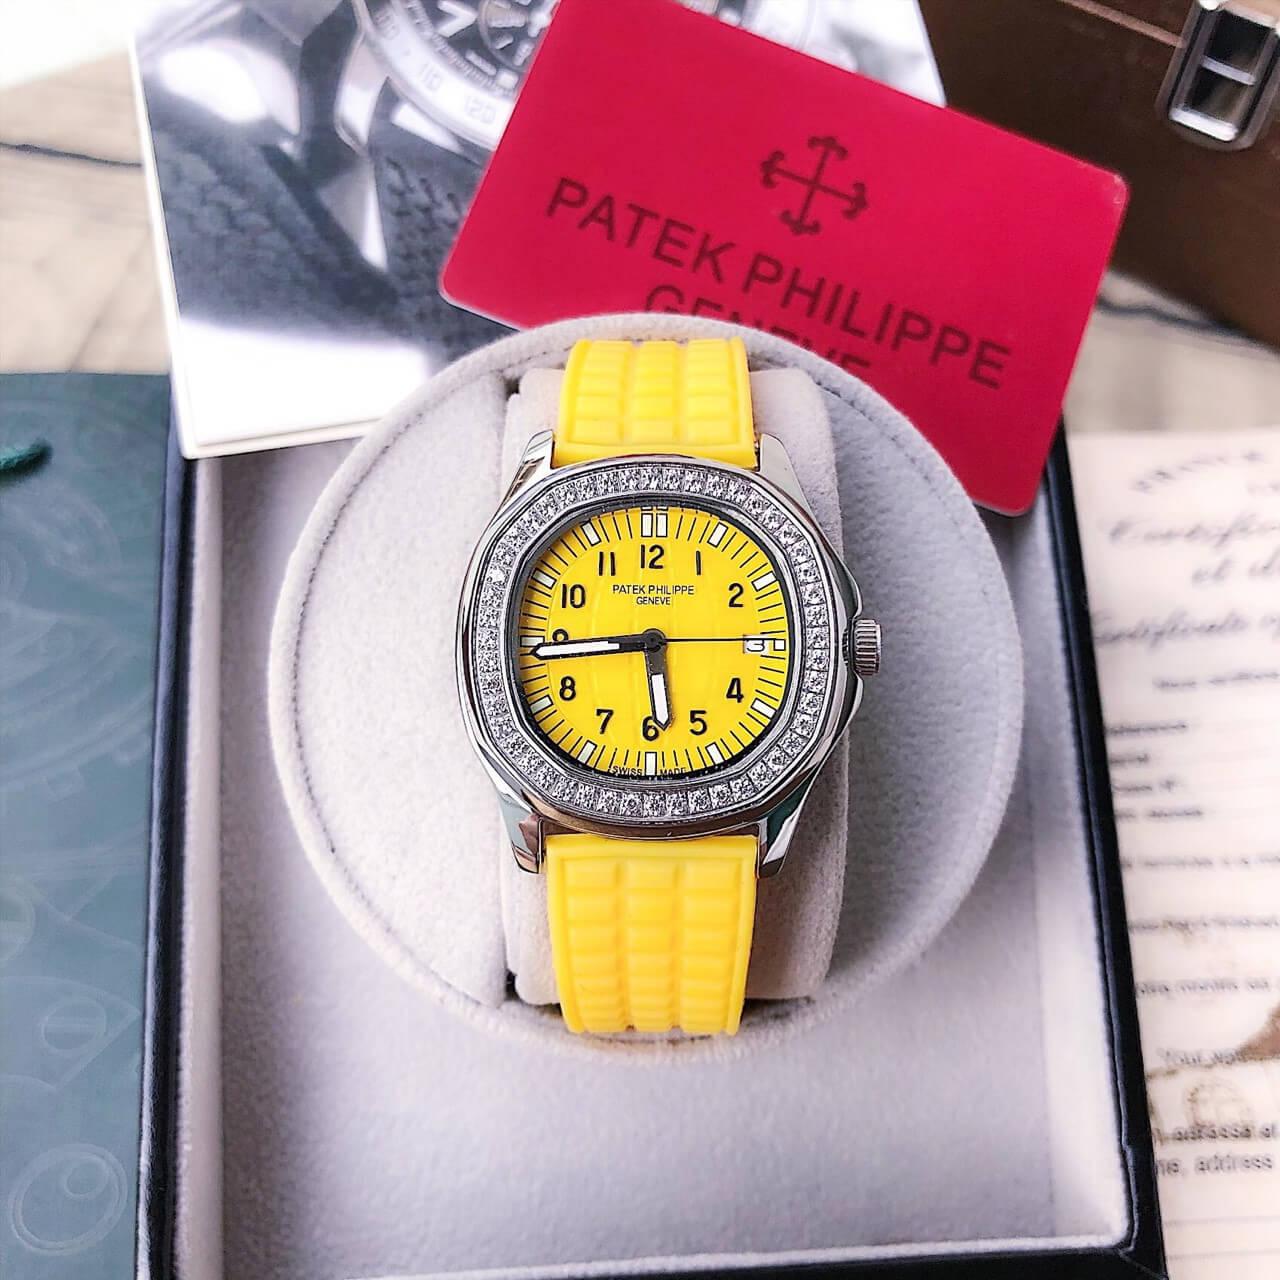 đồng hồ Patek Philippe Nautilus Lady nữ dây cao su cam cao cấp